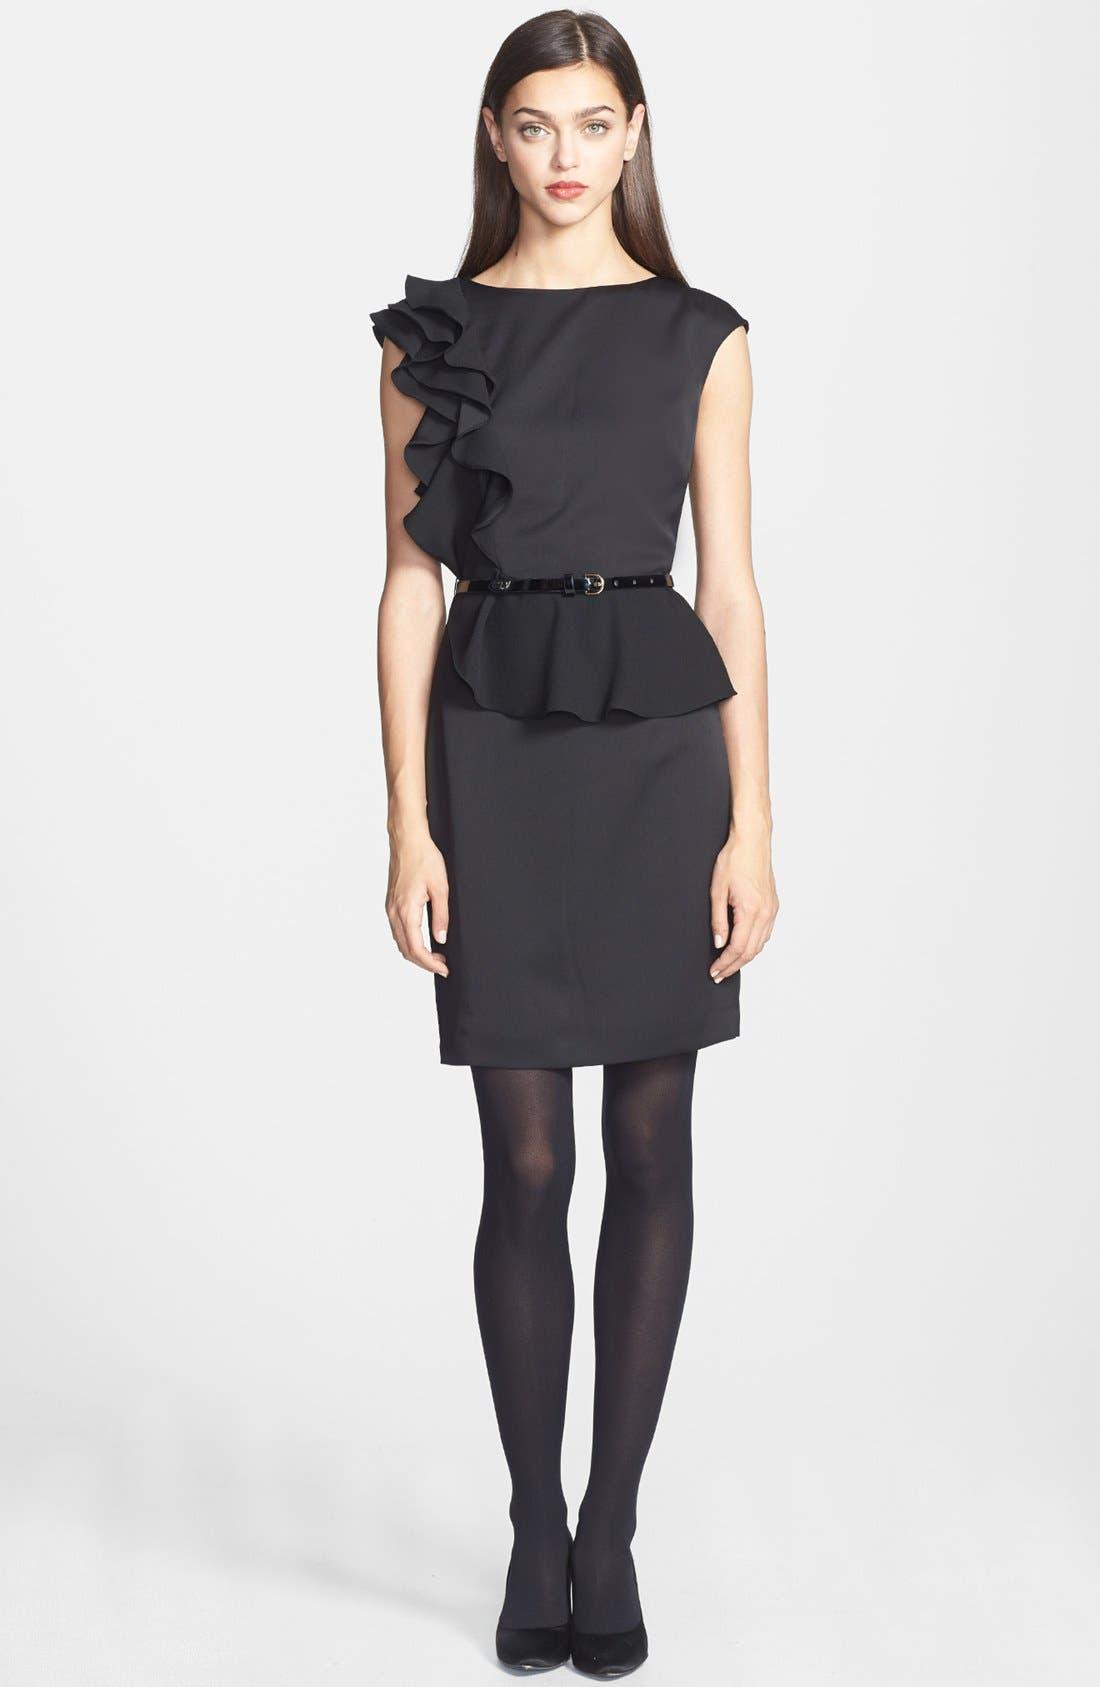 Alternate Image 1 Selected - Ted Baker London 'Poielle' Woven Sheath Dress